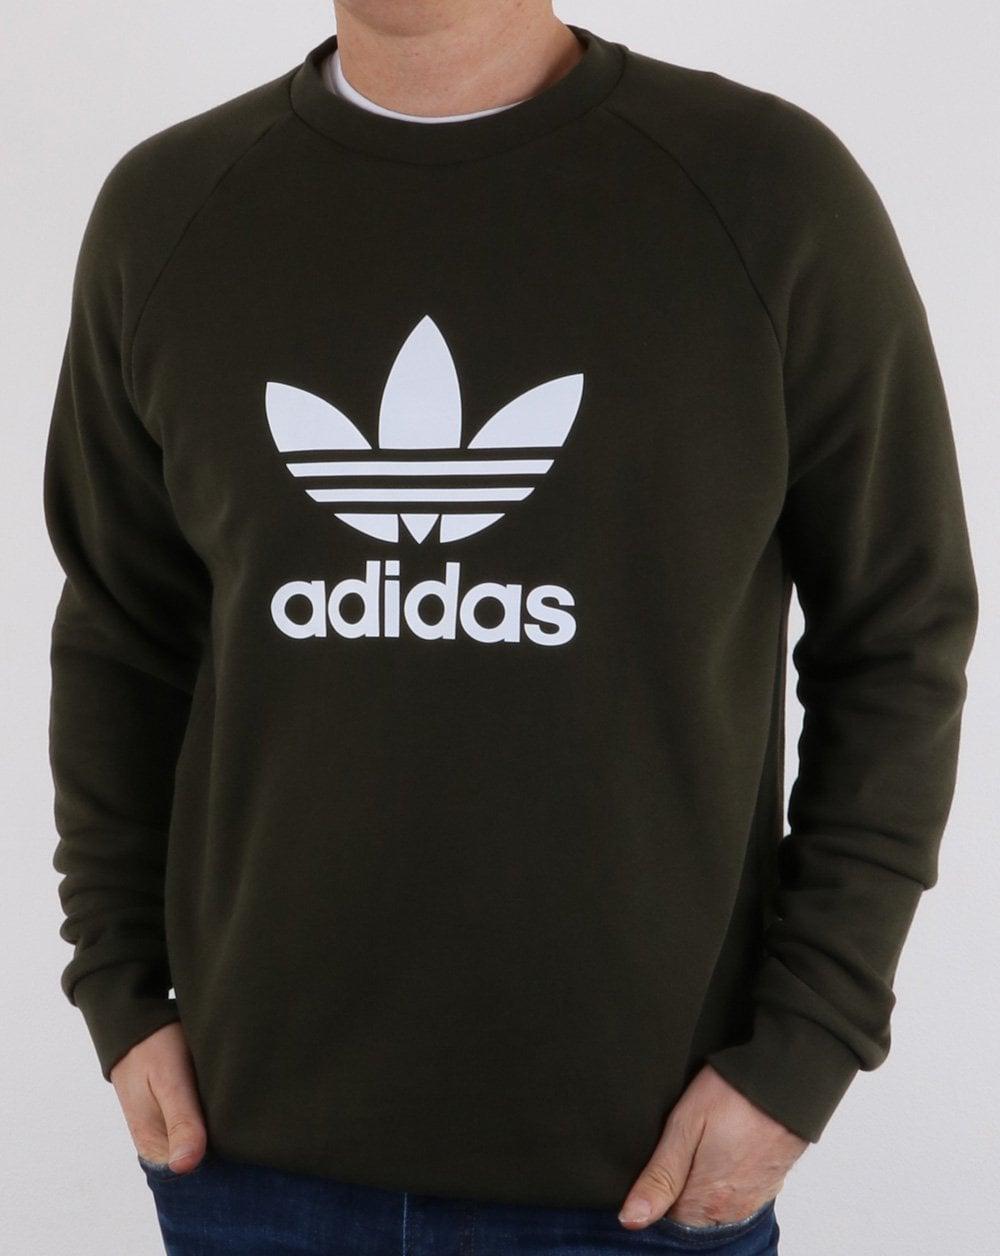 Adidas Originals Trefoil Sweatshirt khaki